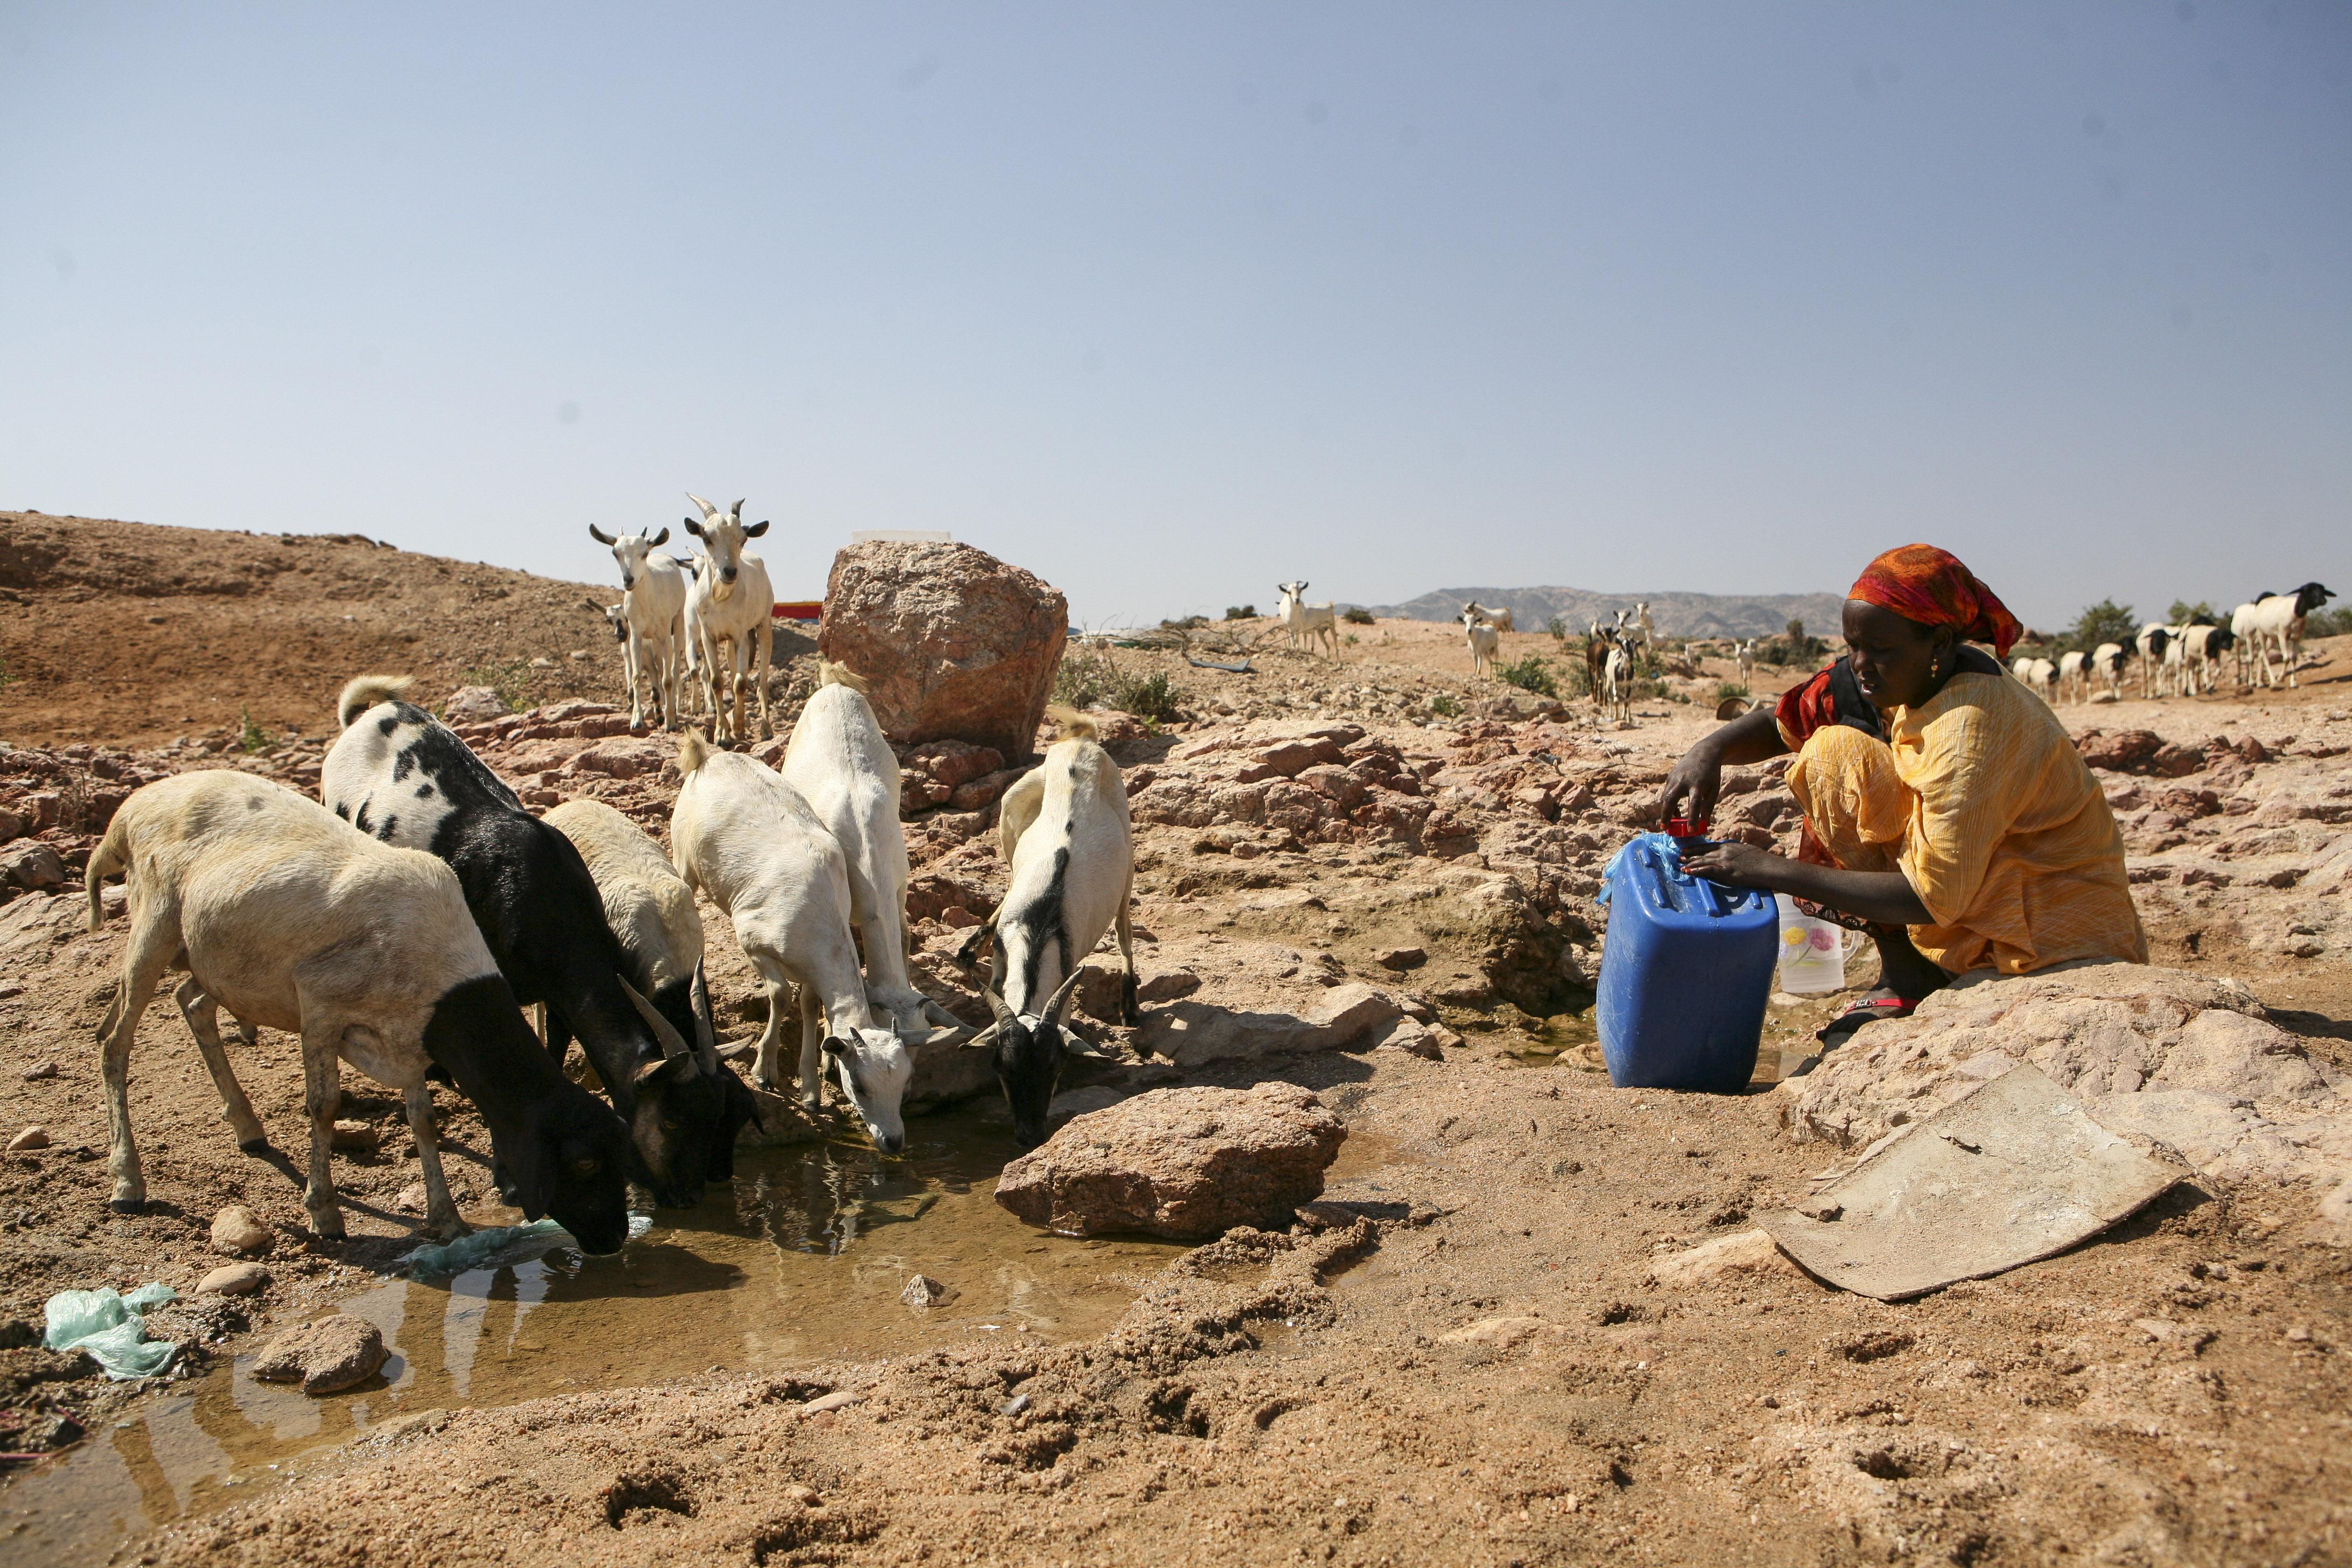 undp-so-drought-water-woman-livestock.jpg.pagespeed.ce.XyuDiBZdXL